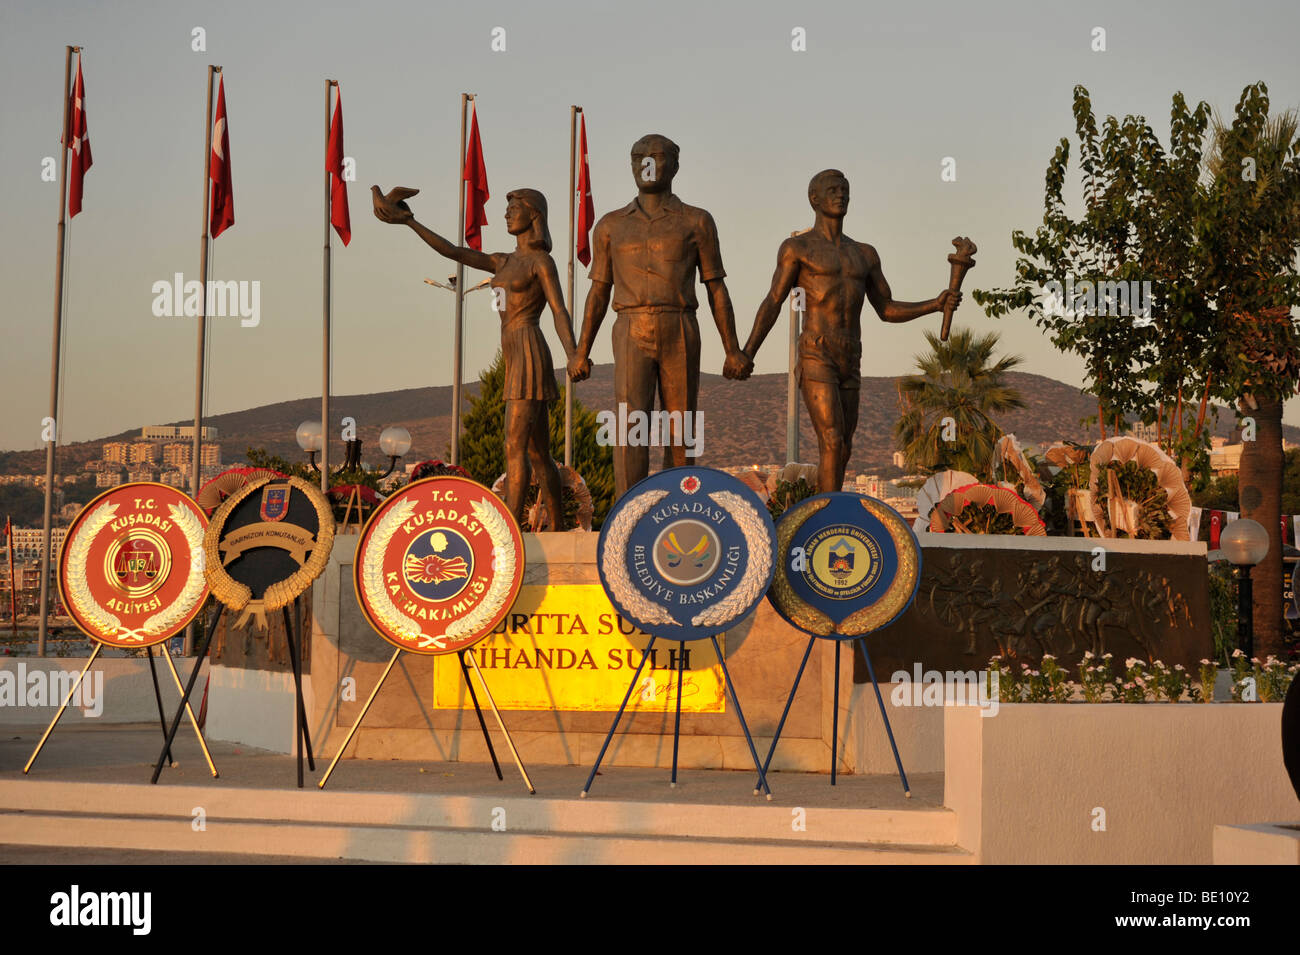 Atatuerk monument in Kusadasi, Turkey. - Stock Image